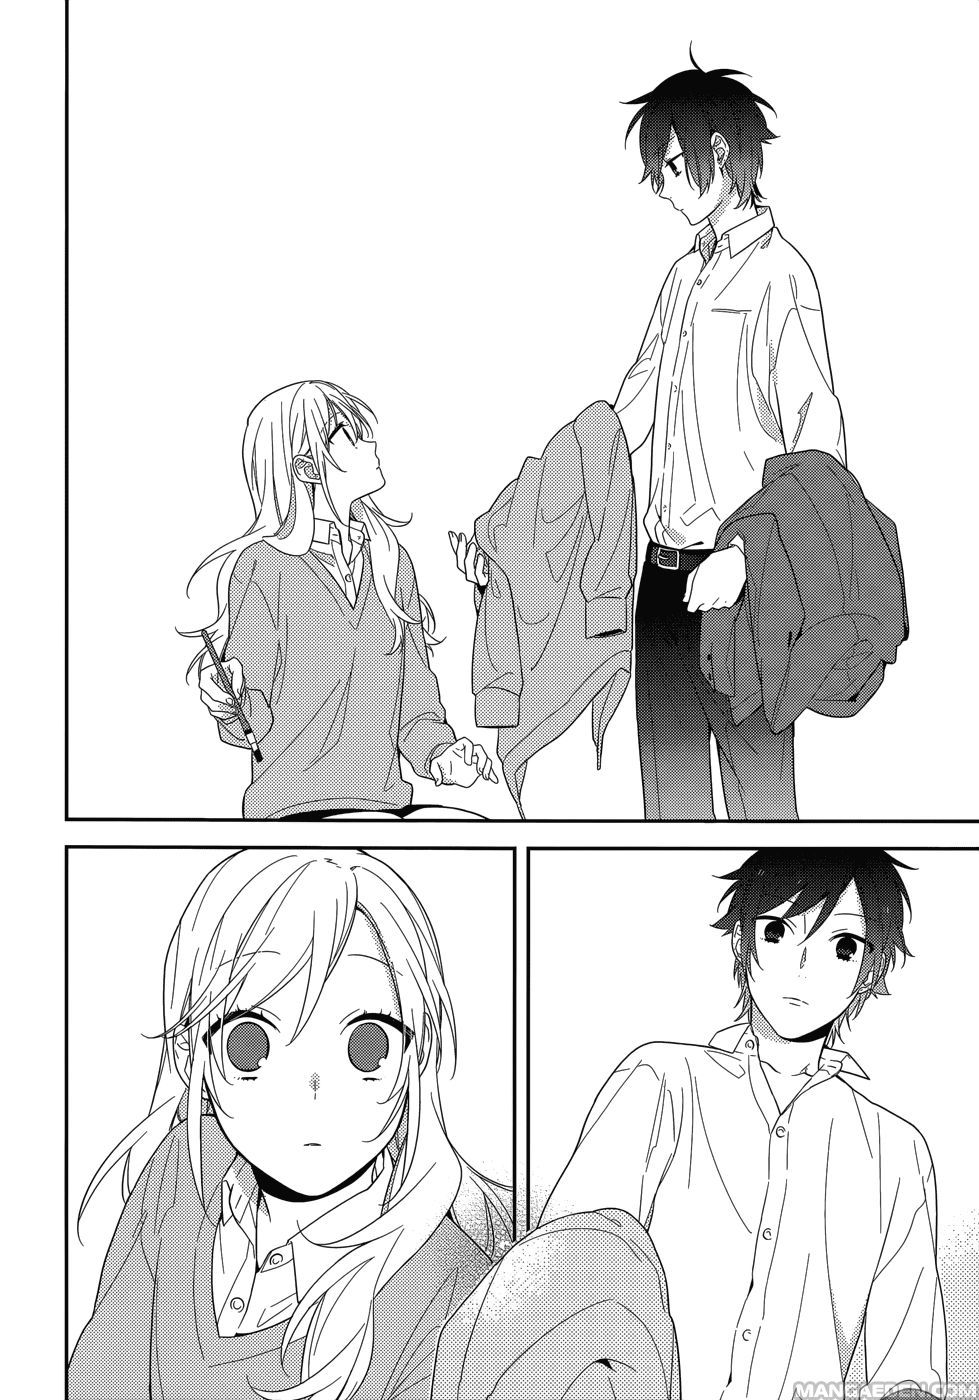 MangaHorimiya chapter 49 Horimiya, Anime, Manga cosplay